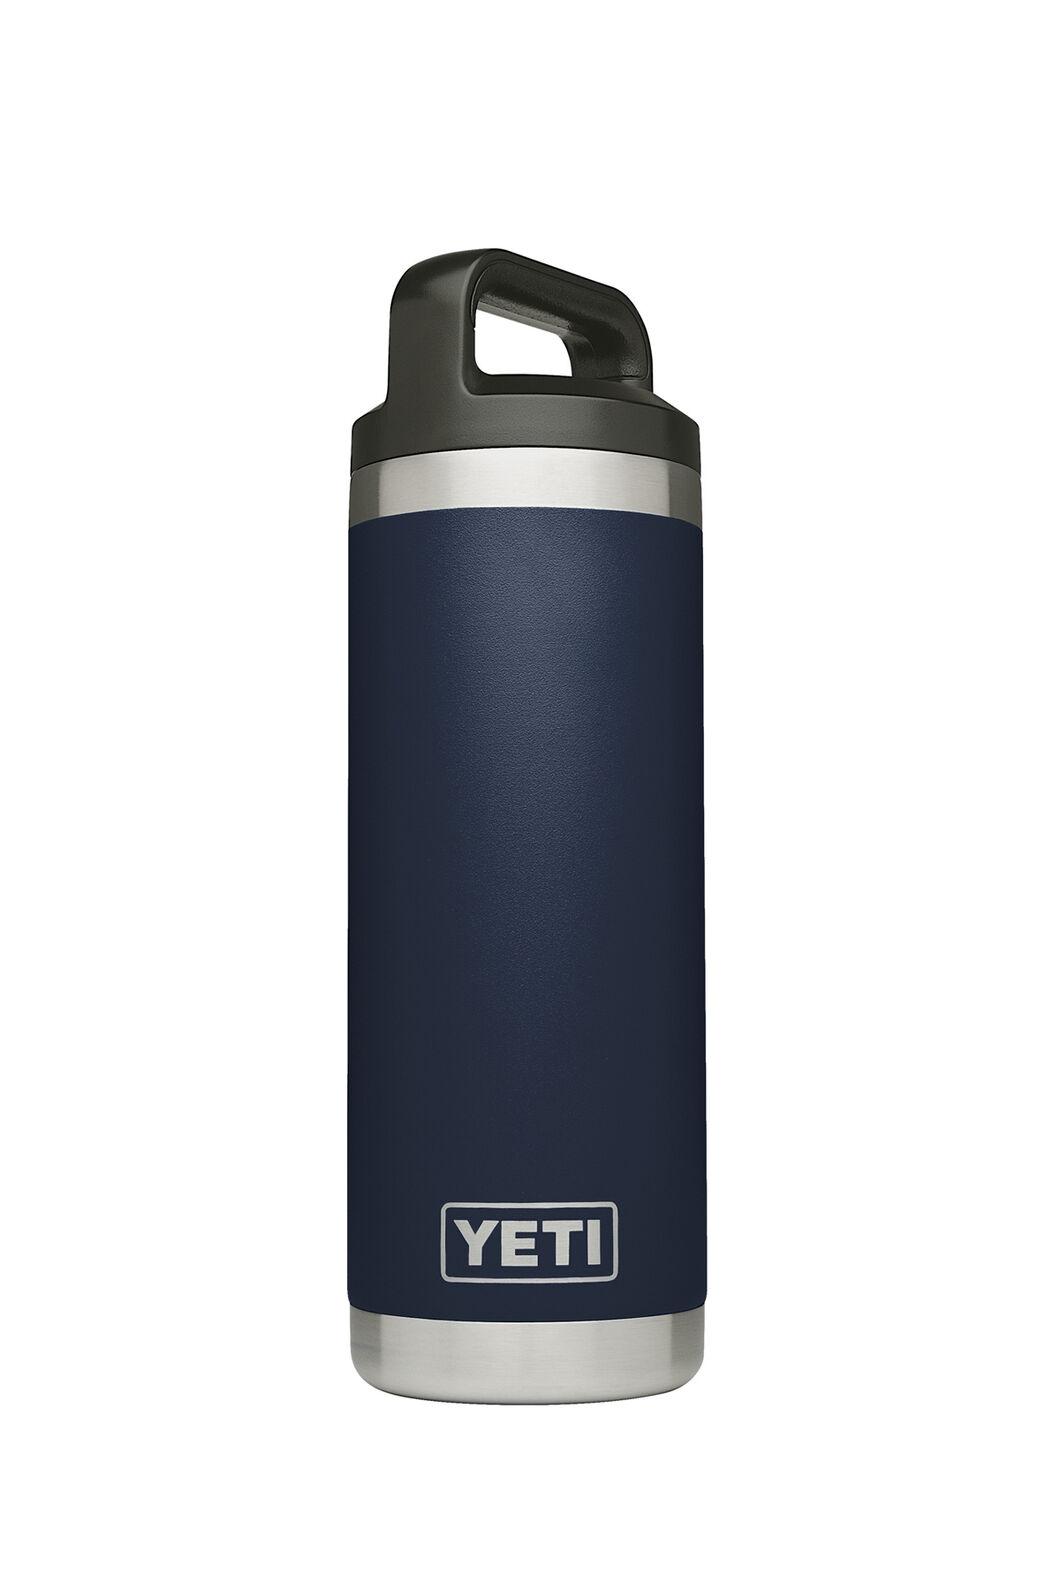 Yeti Rambler Drink Bottle Stainless Steel 18oz, Navy, hi-res